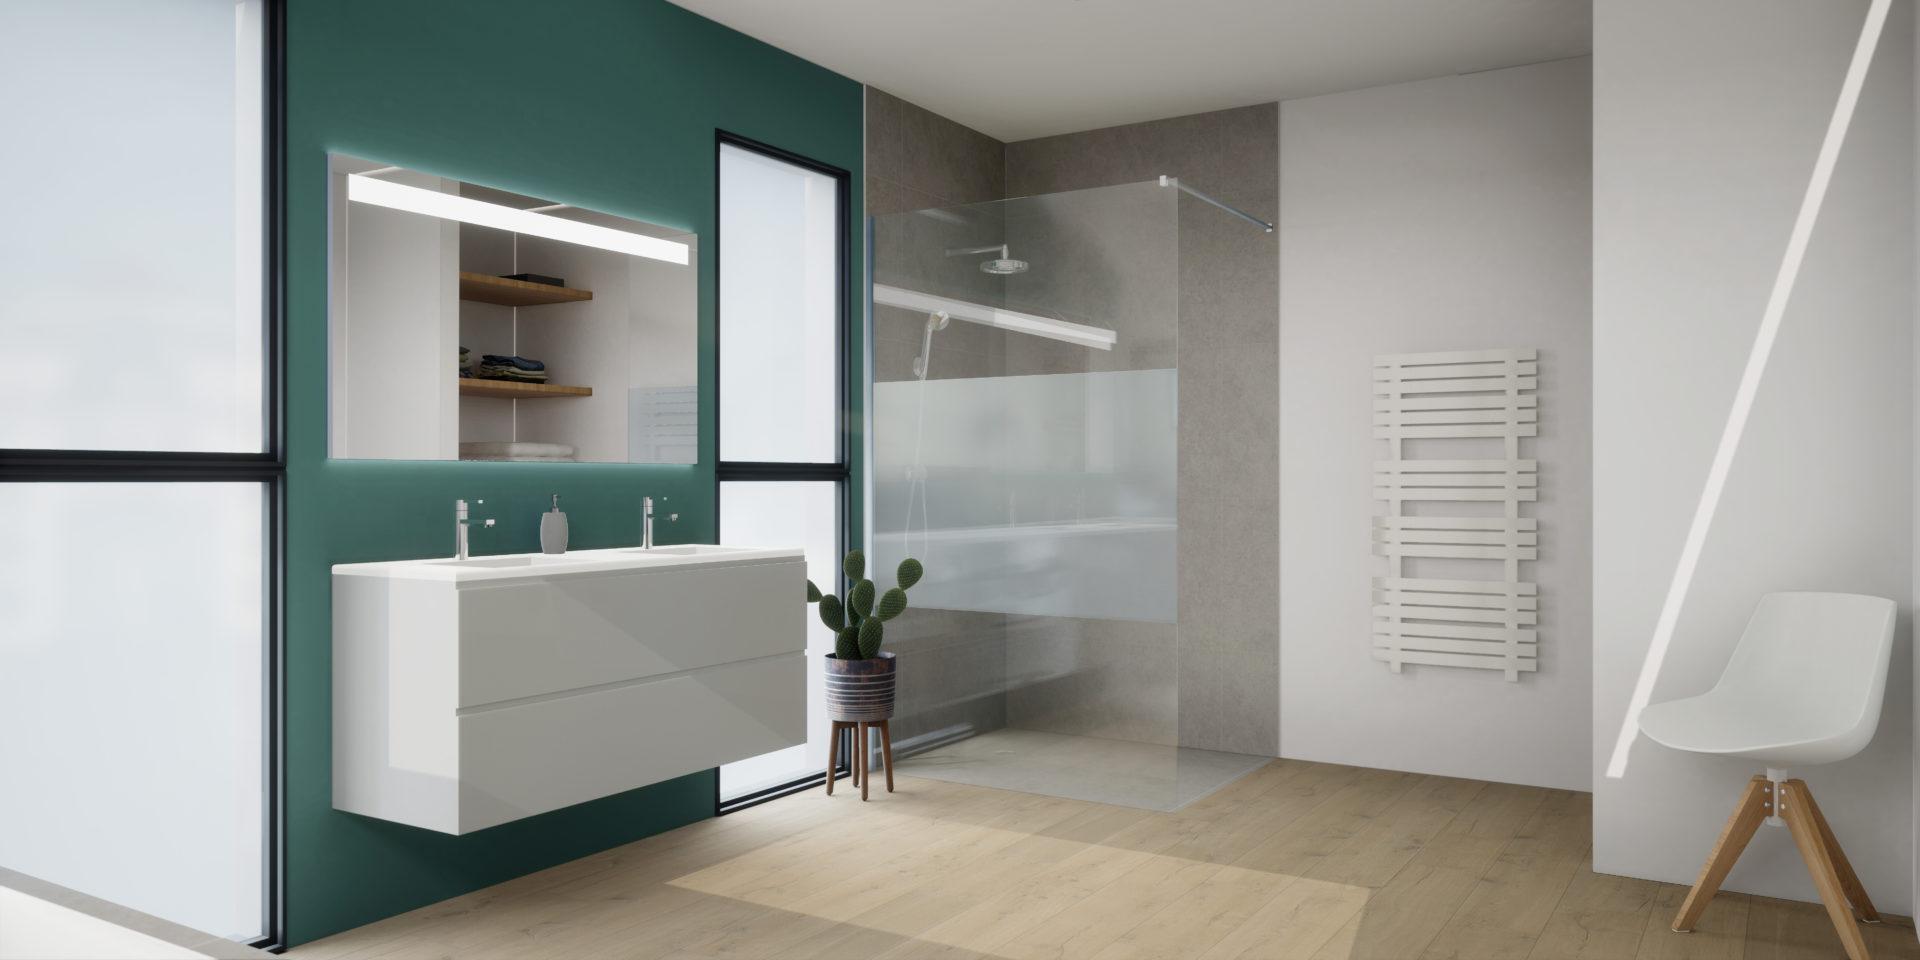 Miroir anti eclat - Miroiterie